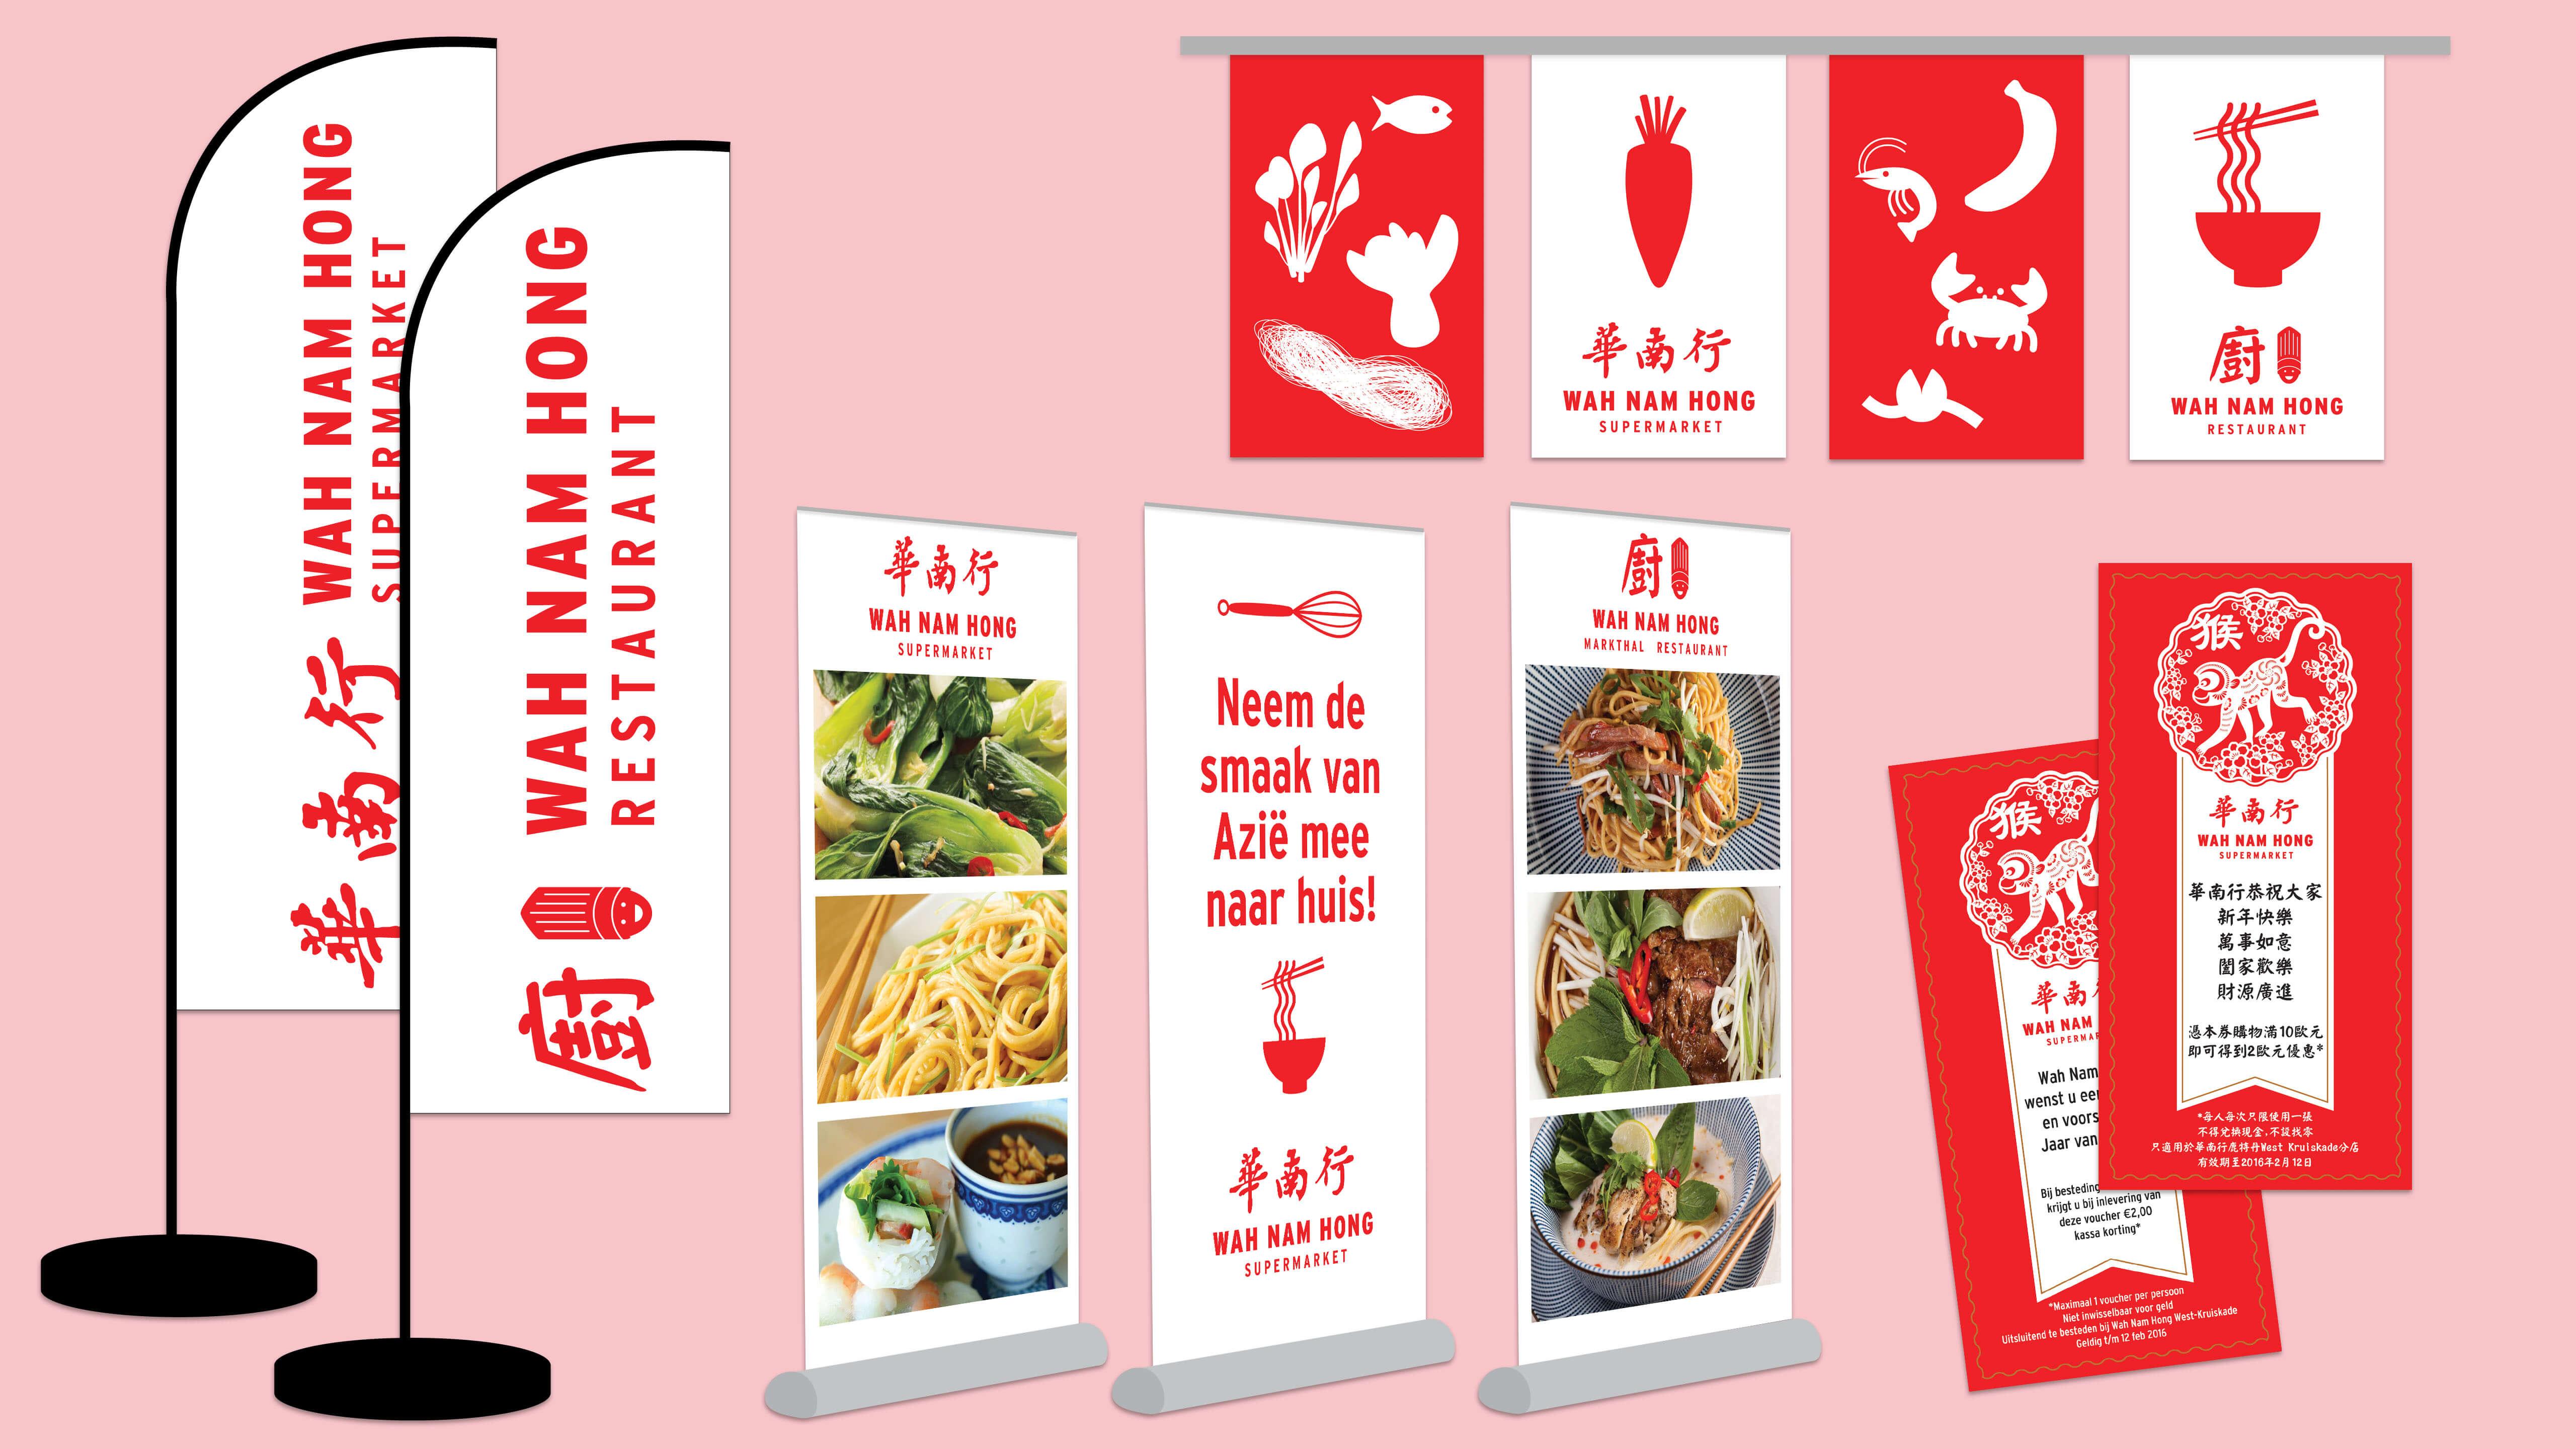 Wah Nam Hong Markthal, restaurant, Mixus studio